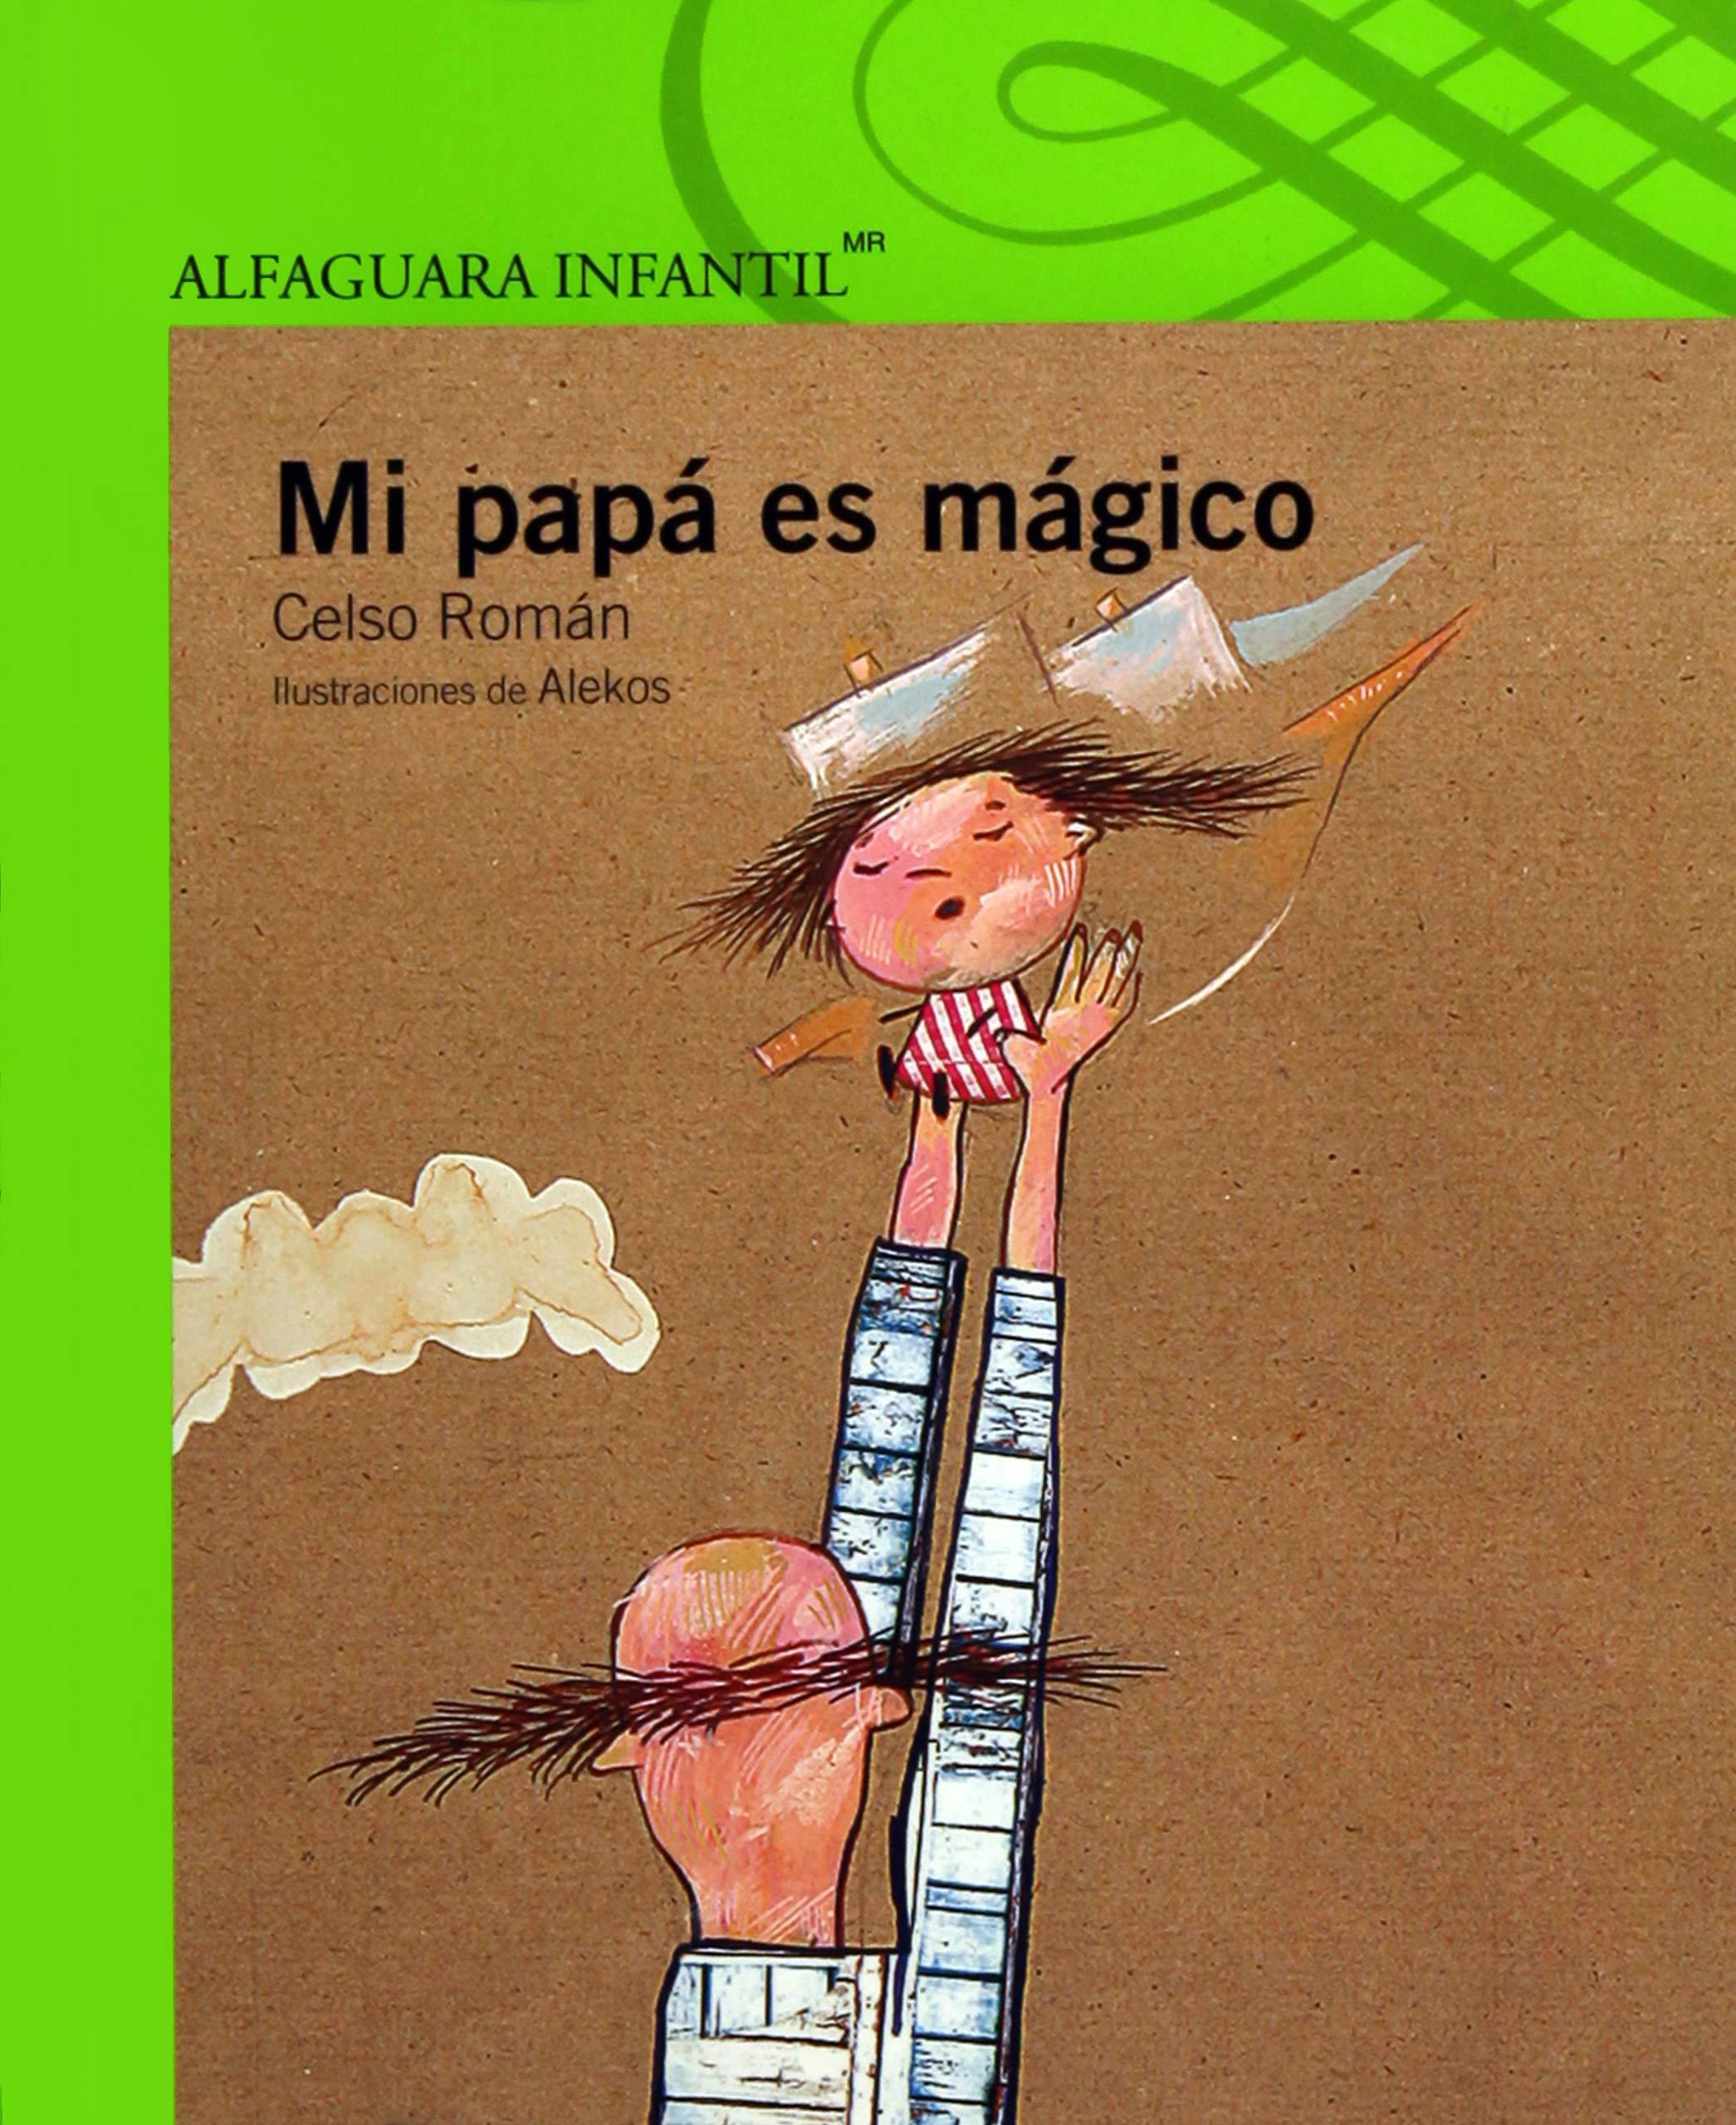 MI PAPA ES MAGICO (Spanish)